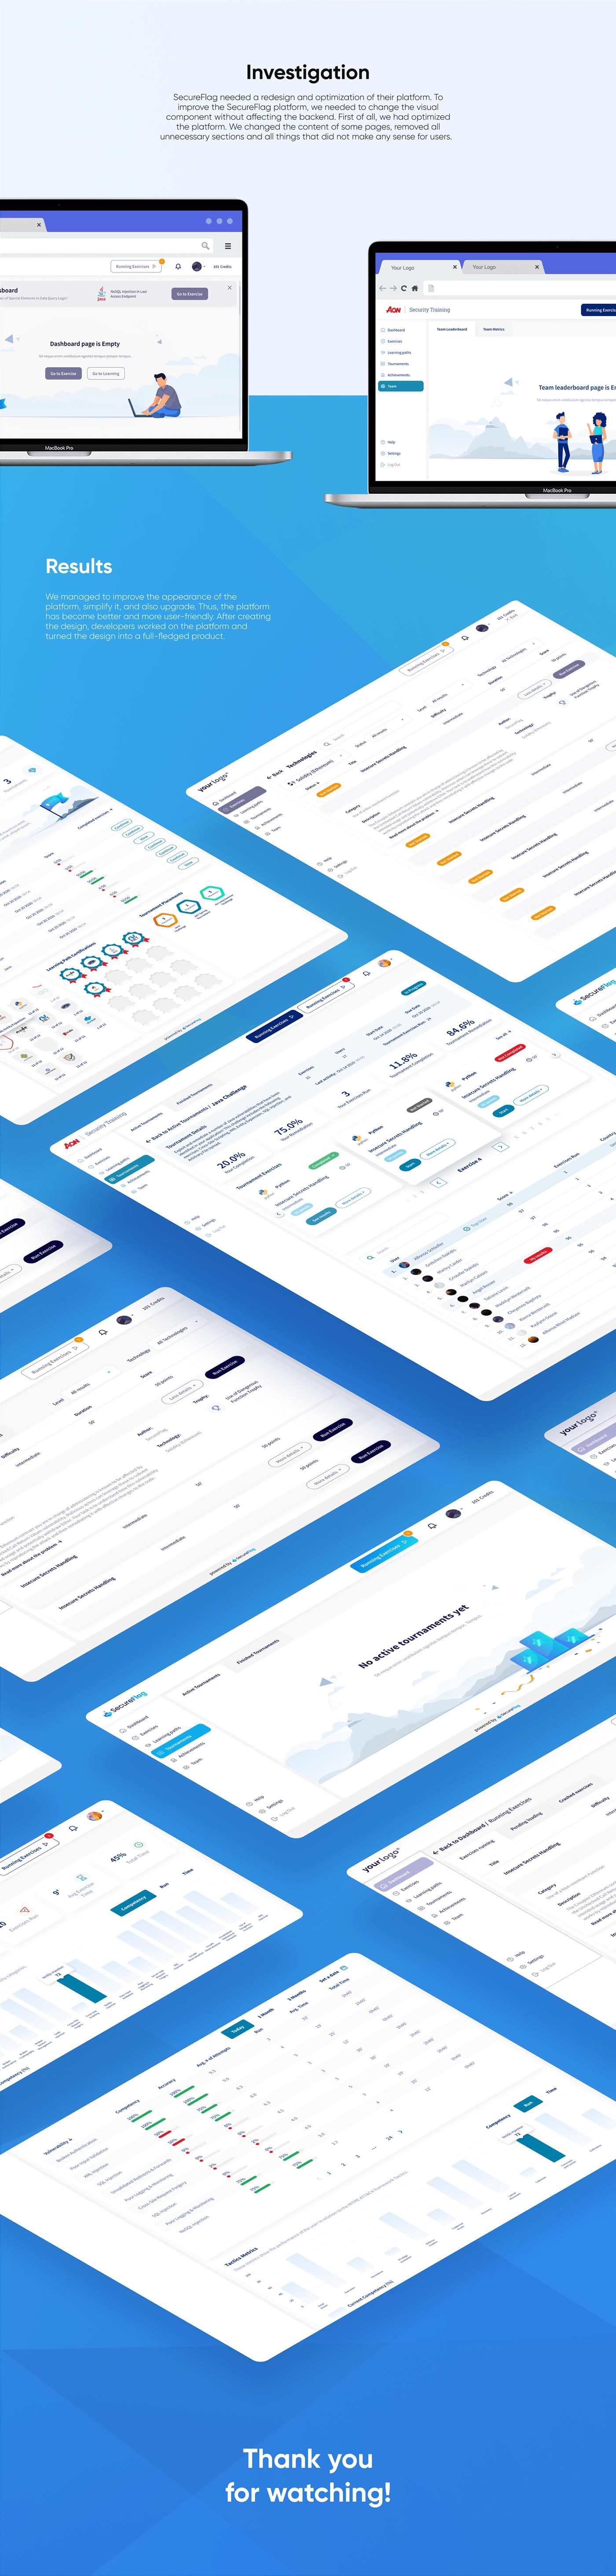 design Figma mvp Platform product SAAS site Startup training uxui